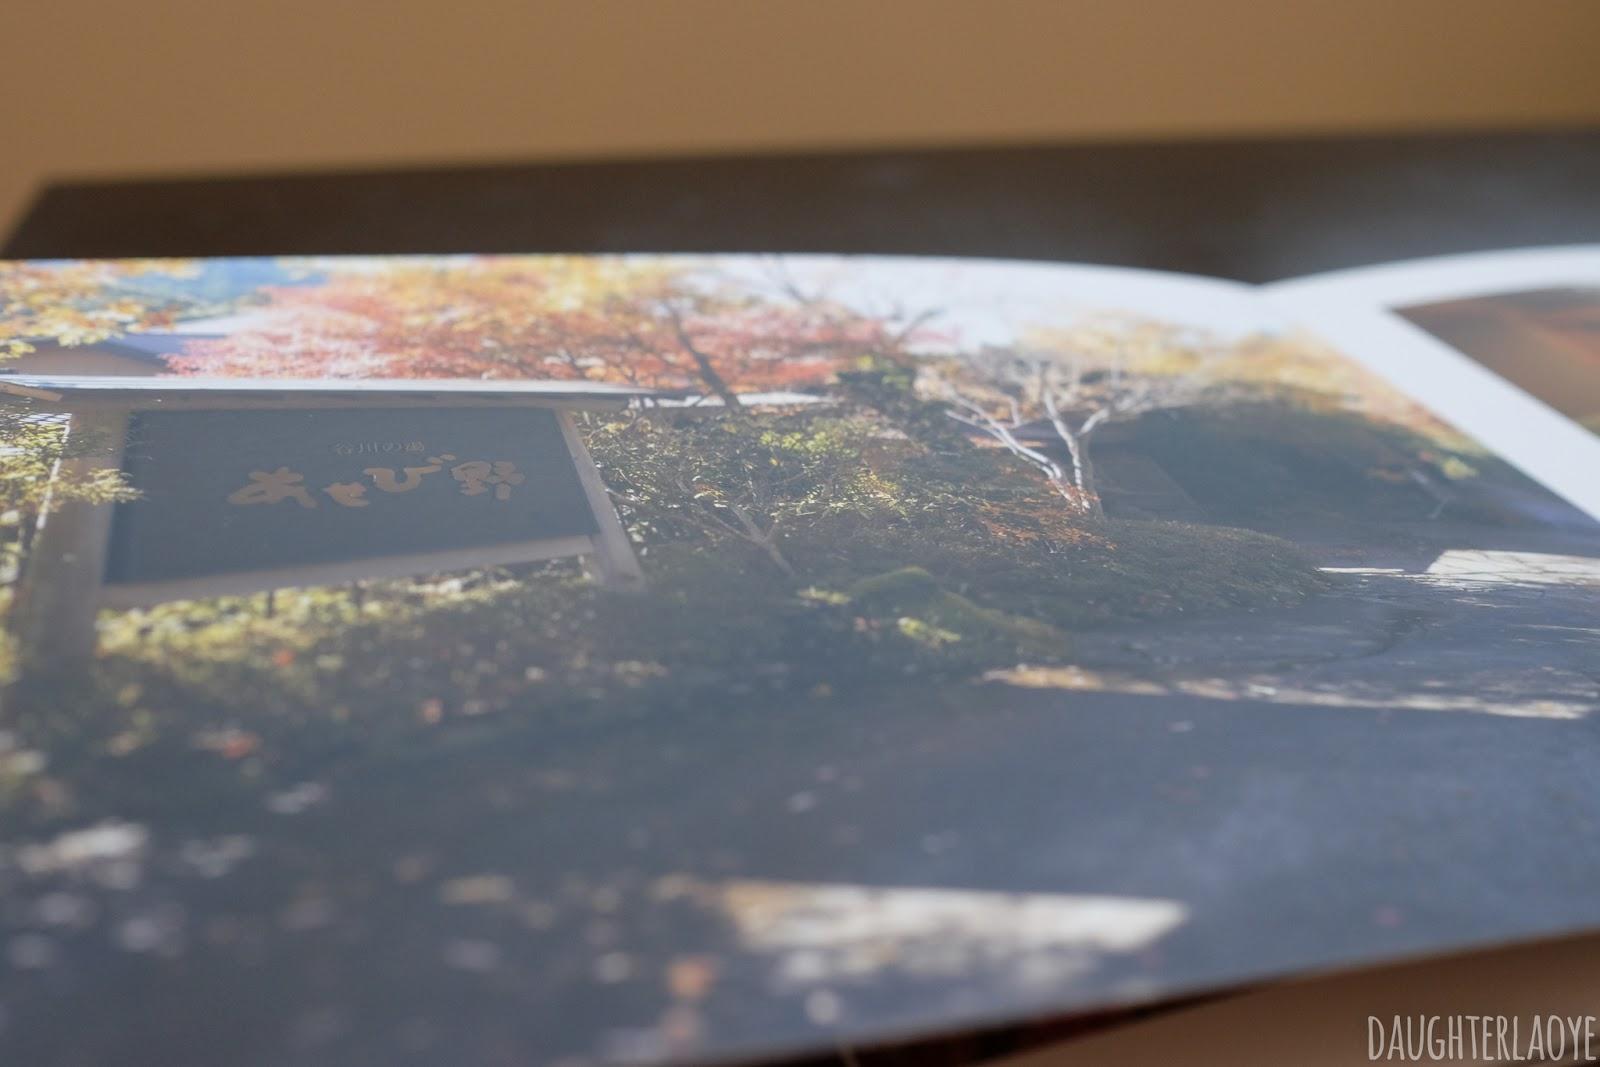 Daughter Lao Ye: Photobook Review: AdoramaPix Fuji Deep